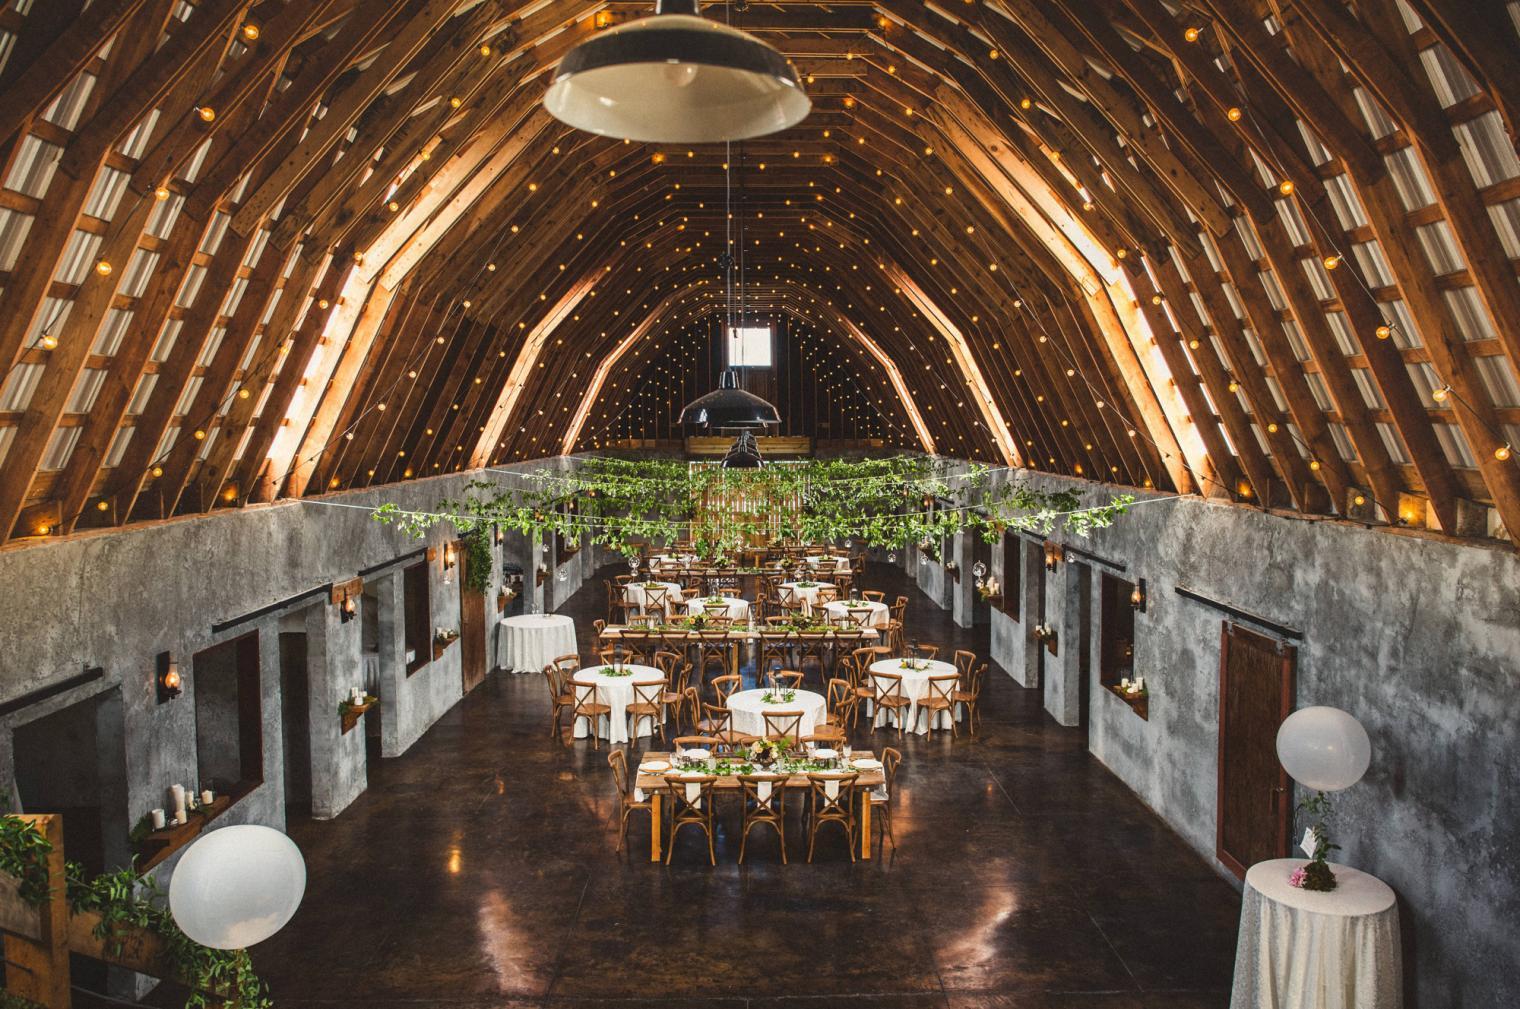 15 Whimsical Wedding Venues in North Carolina